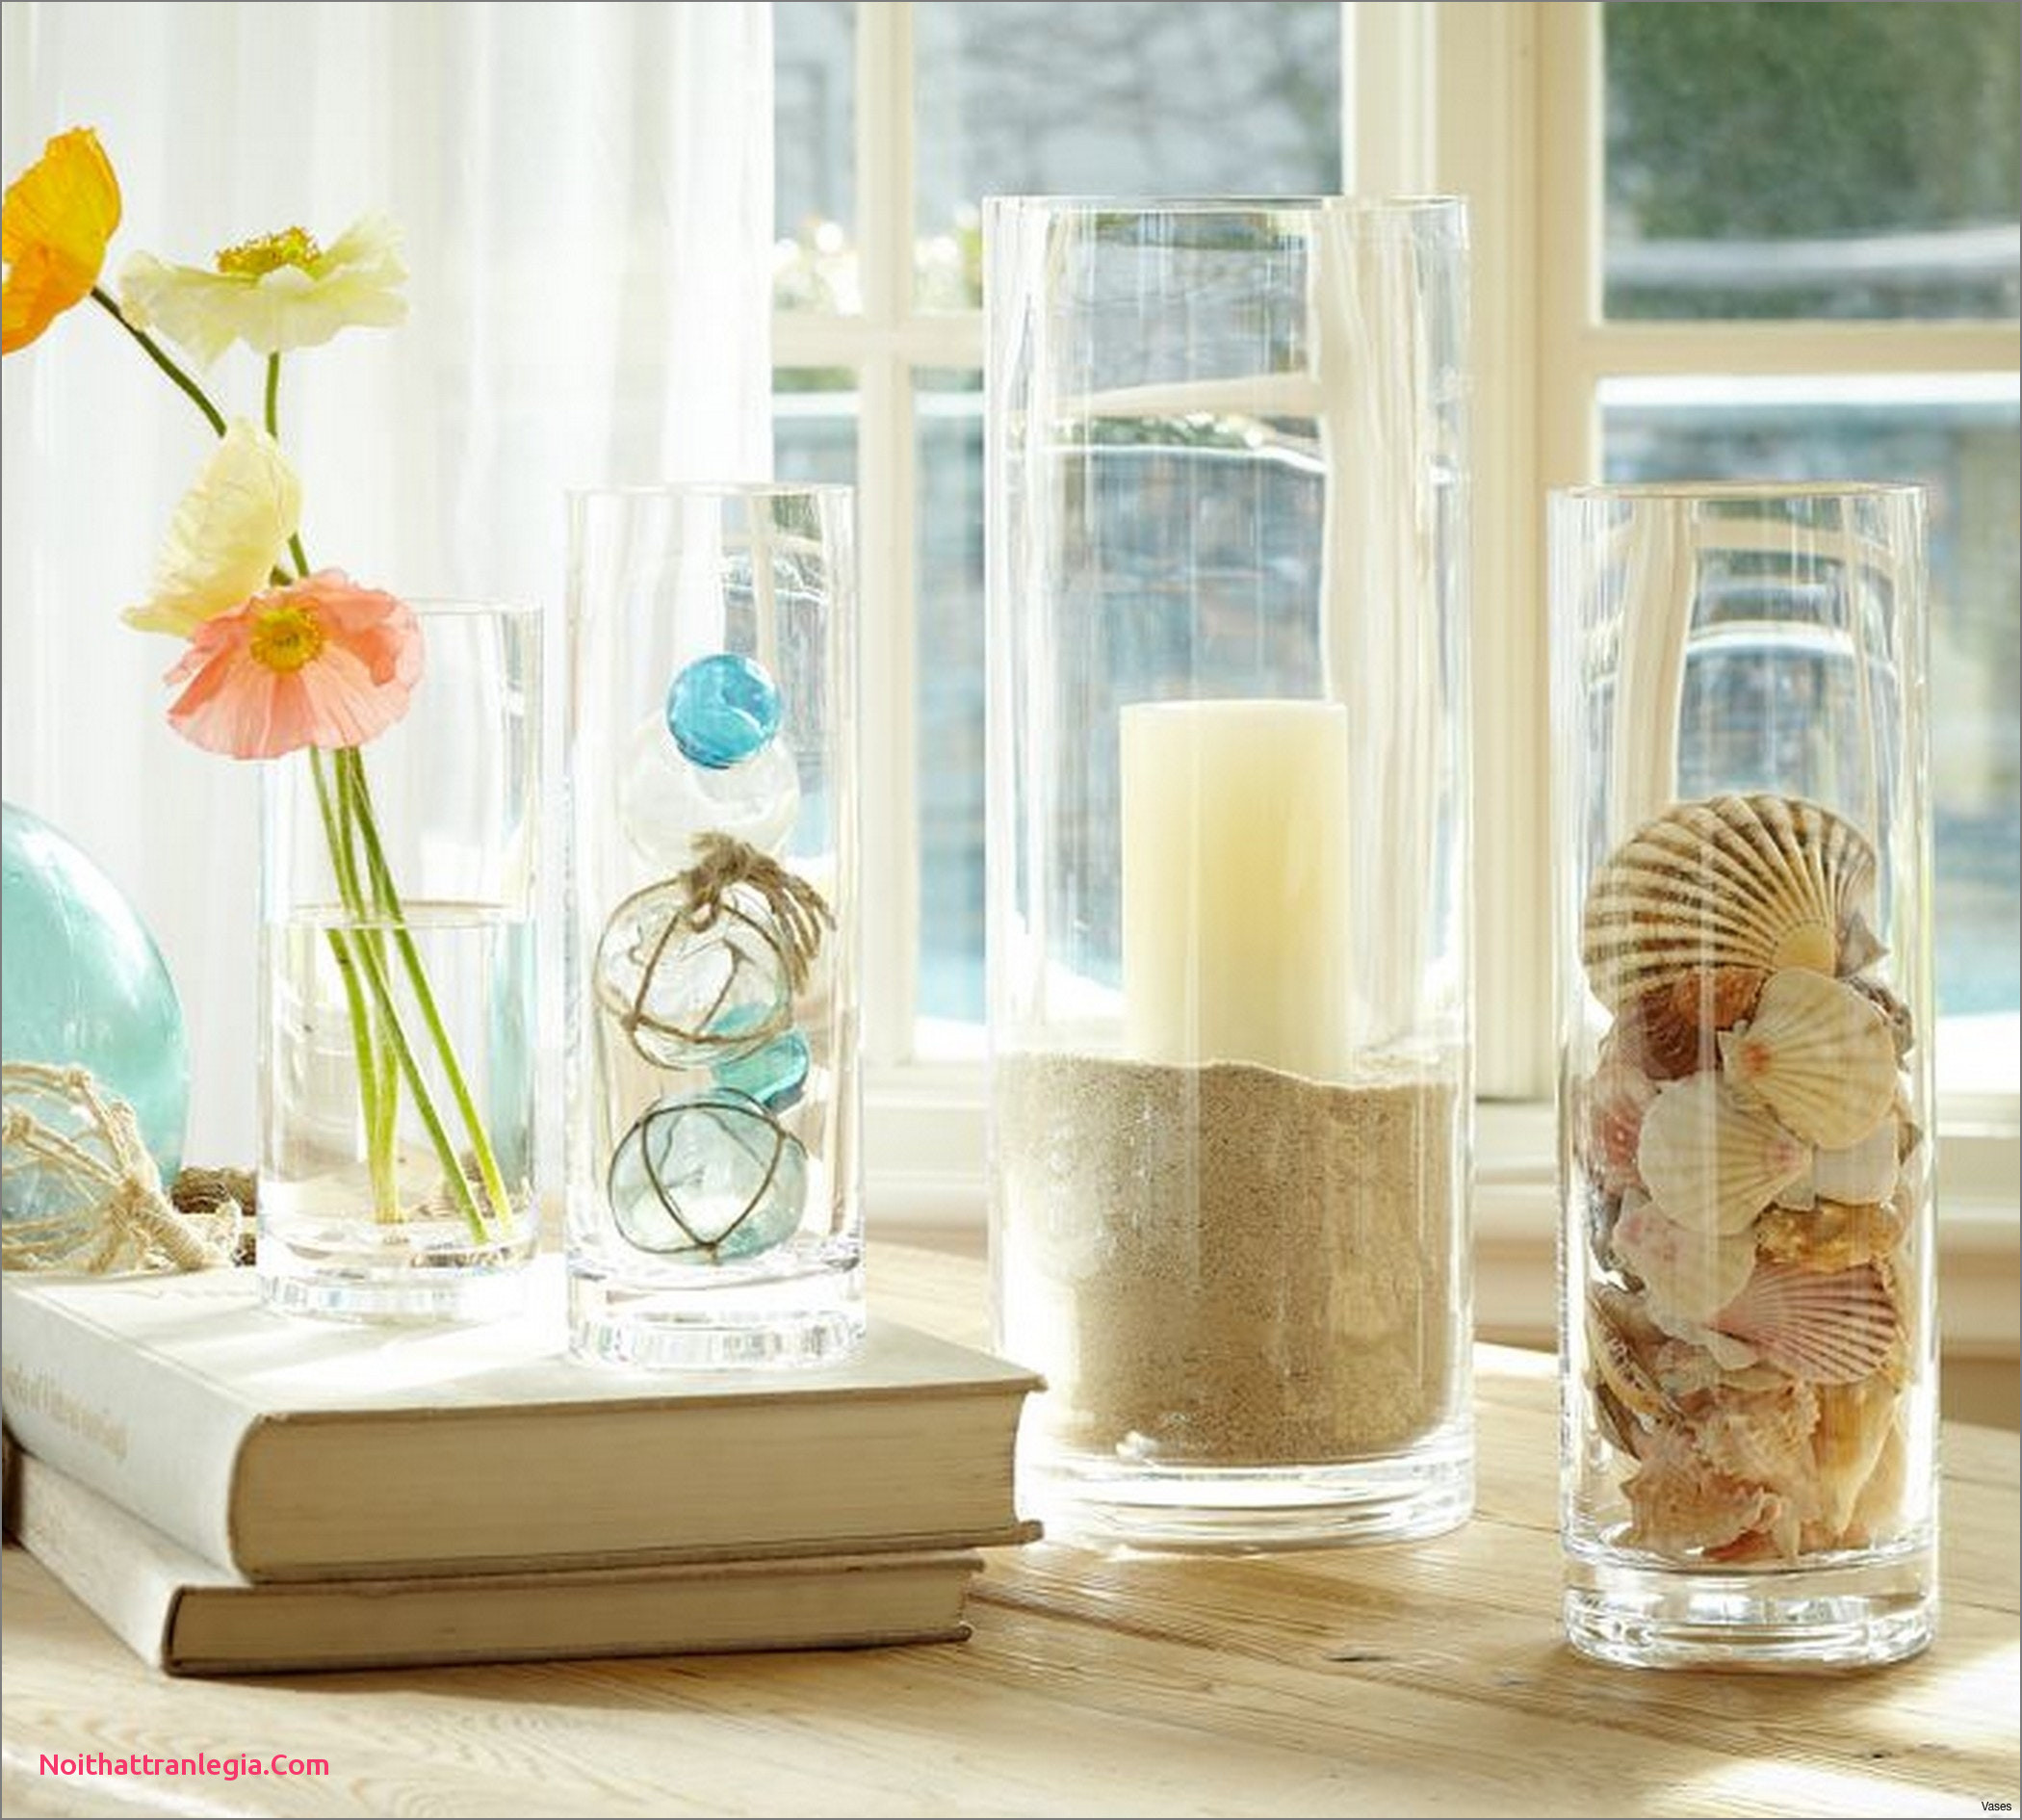 cylinder flower vase of 20 how to make mercury glass vases noithattranlegia vases design in glass vase fillers vase filler ideas 5h vases summer 5i 0d inspiration vase